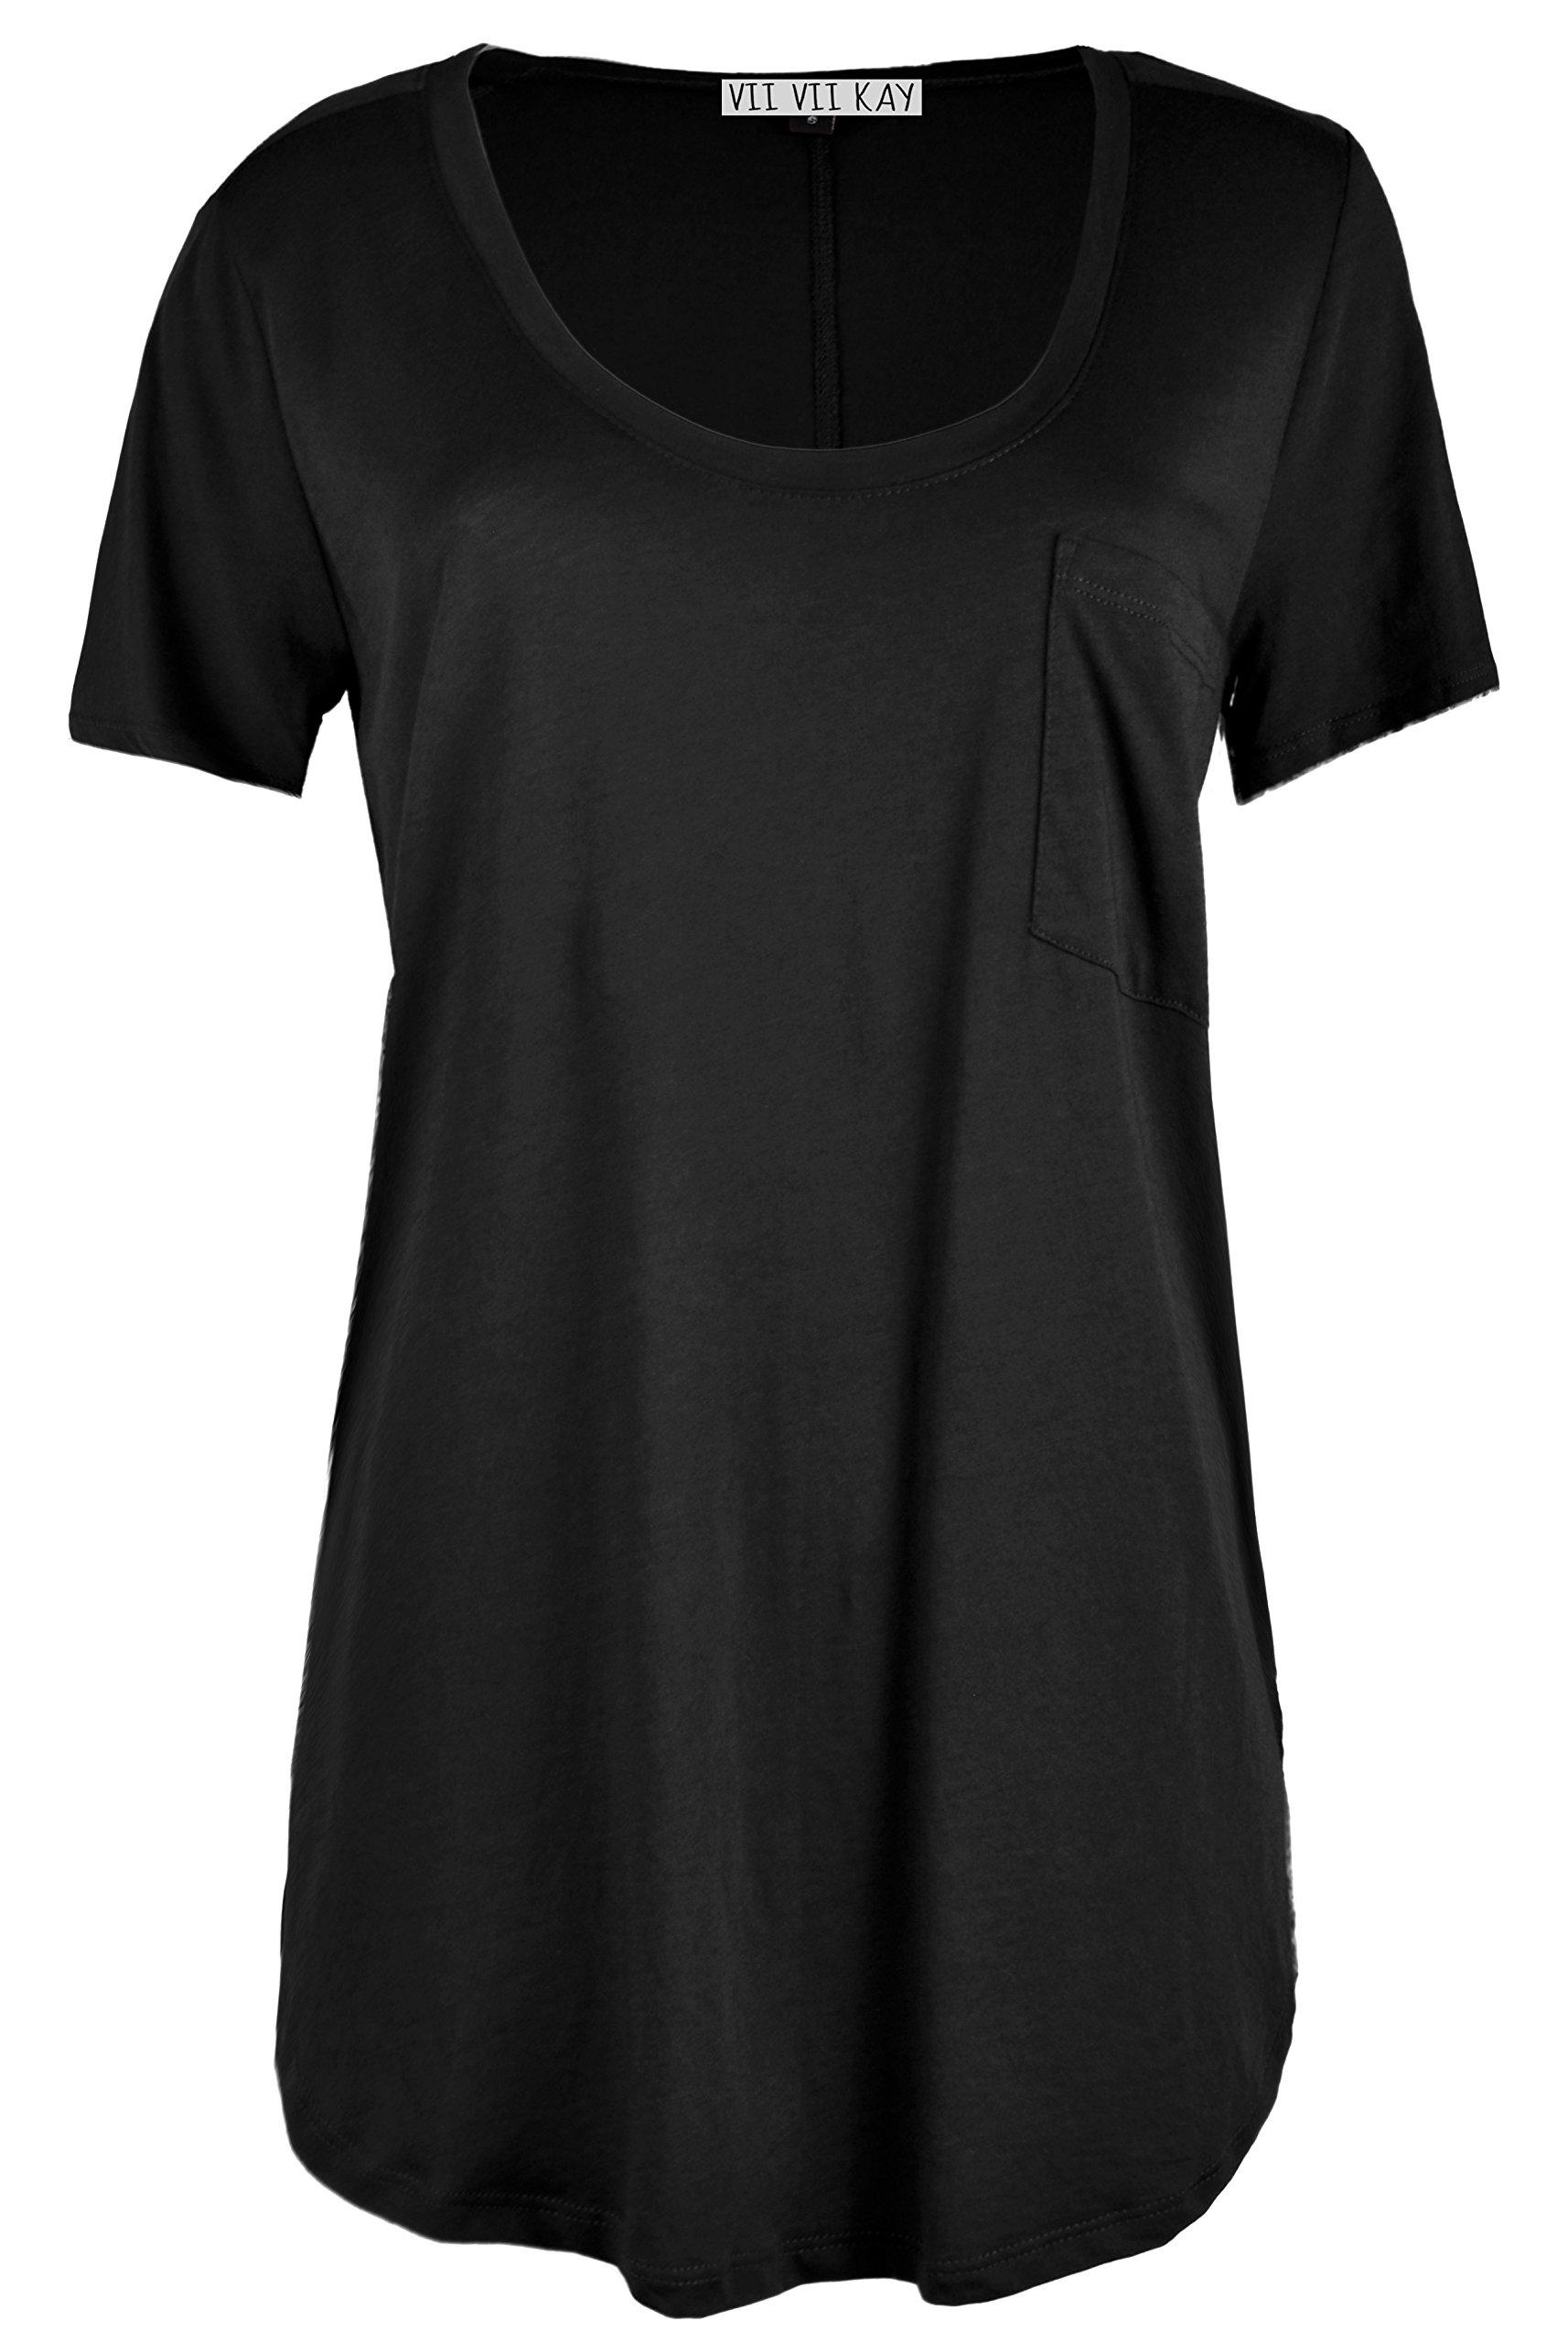 ViiViiKay VVK Women's Plus Size Crew or V-Neck Loose Fit Shortsleeve High & Low Hem Tops 10_Black 3XL